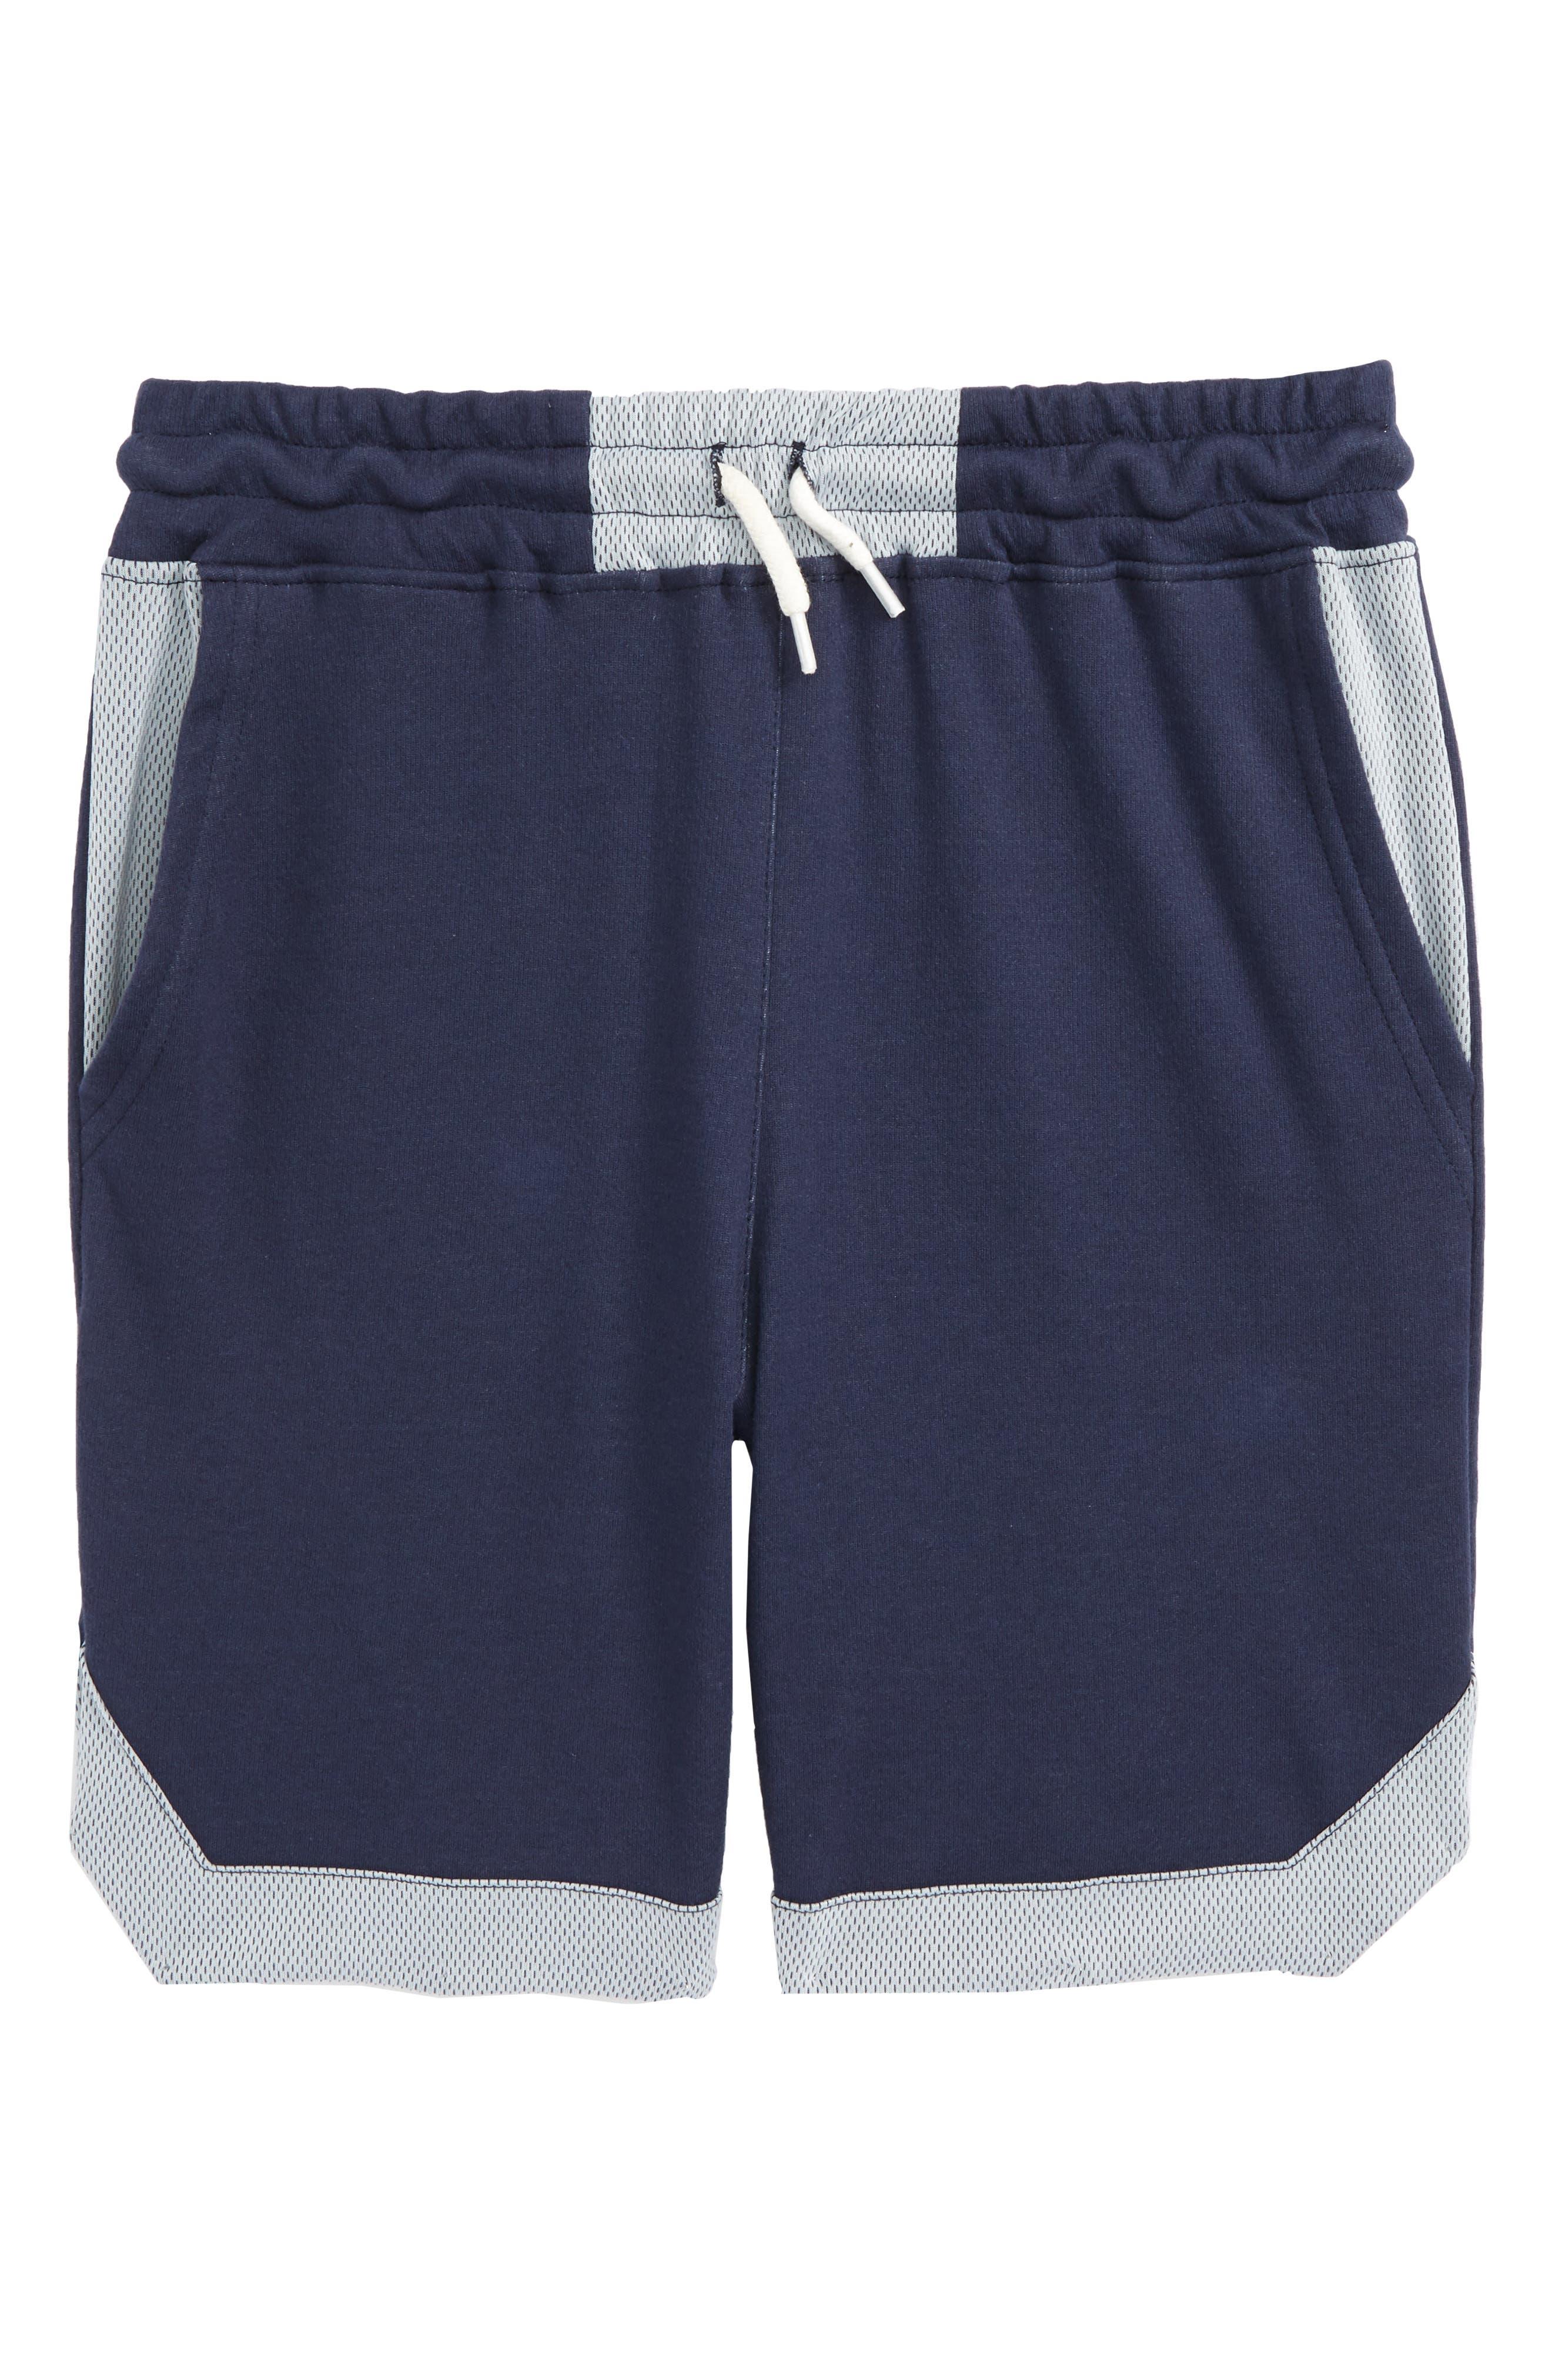 Paneled Shorts,                             Main thumbnail 1, color,                             Academy Blue